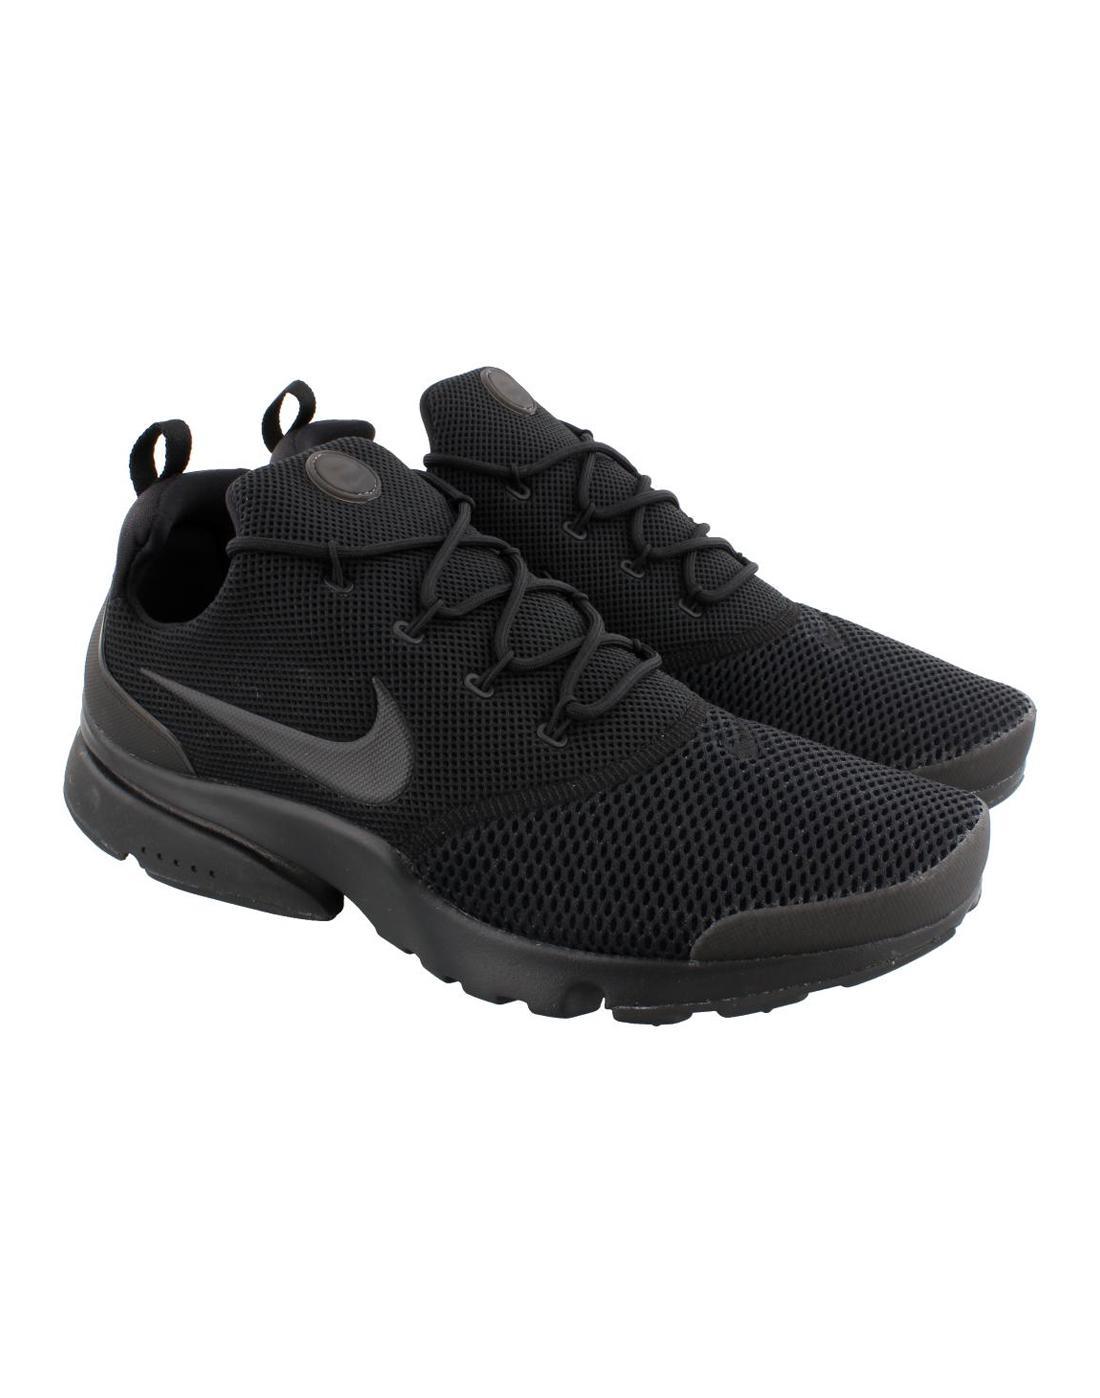 586a8eda6f5f Men s Nike Presto Fly